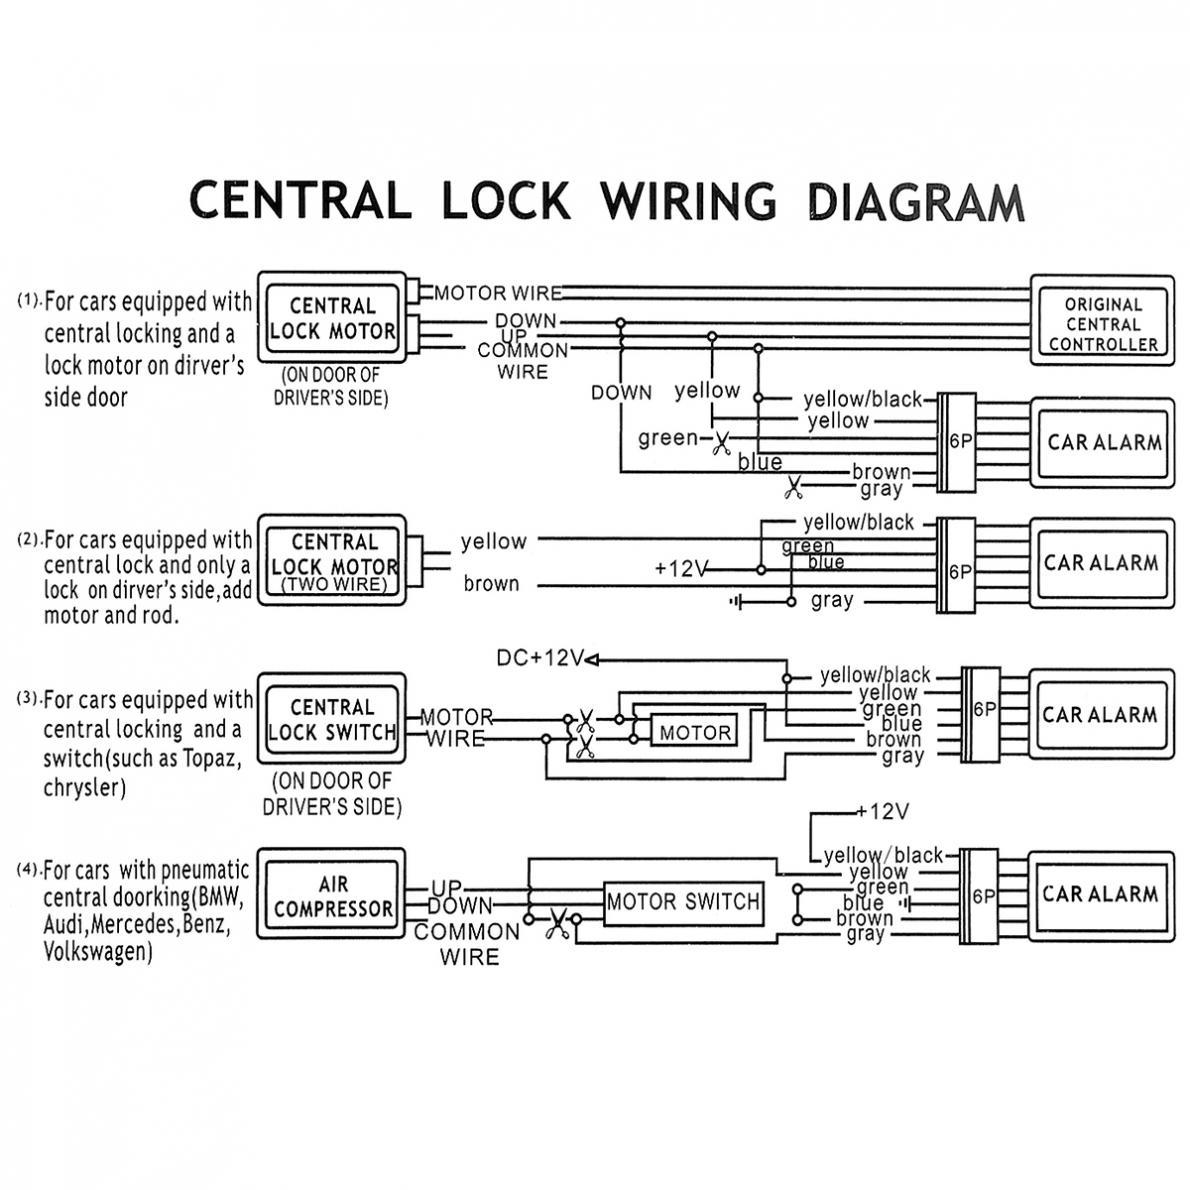 Central Lock Wiring Diagram from ae01.alicdn.com